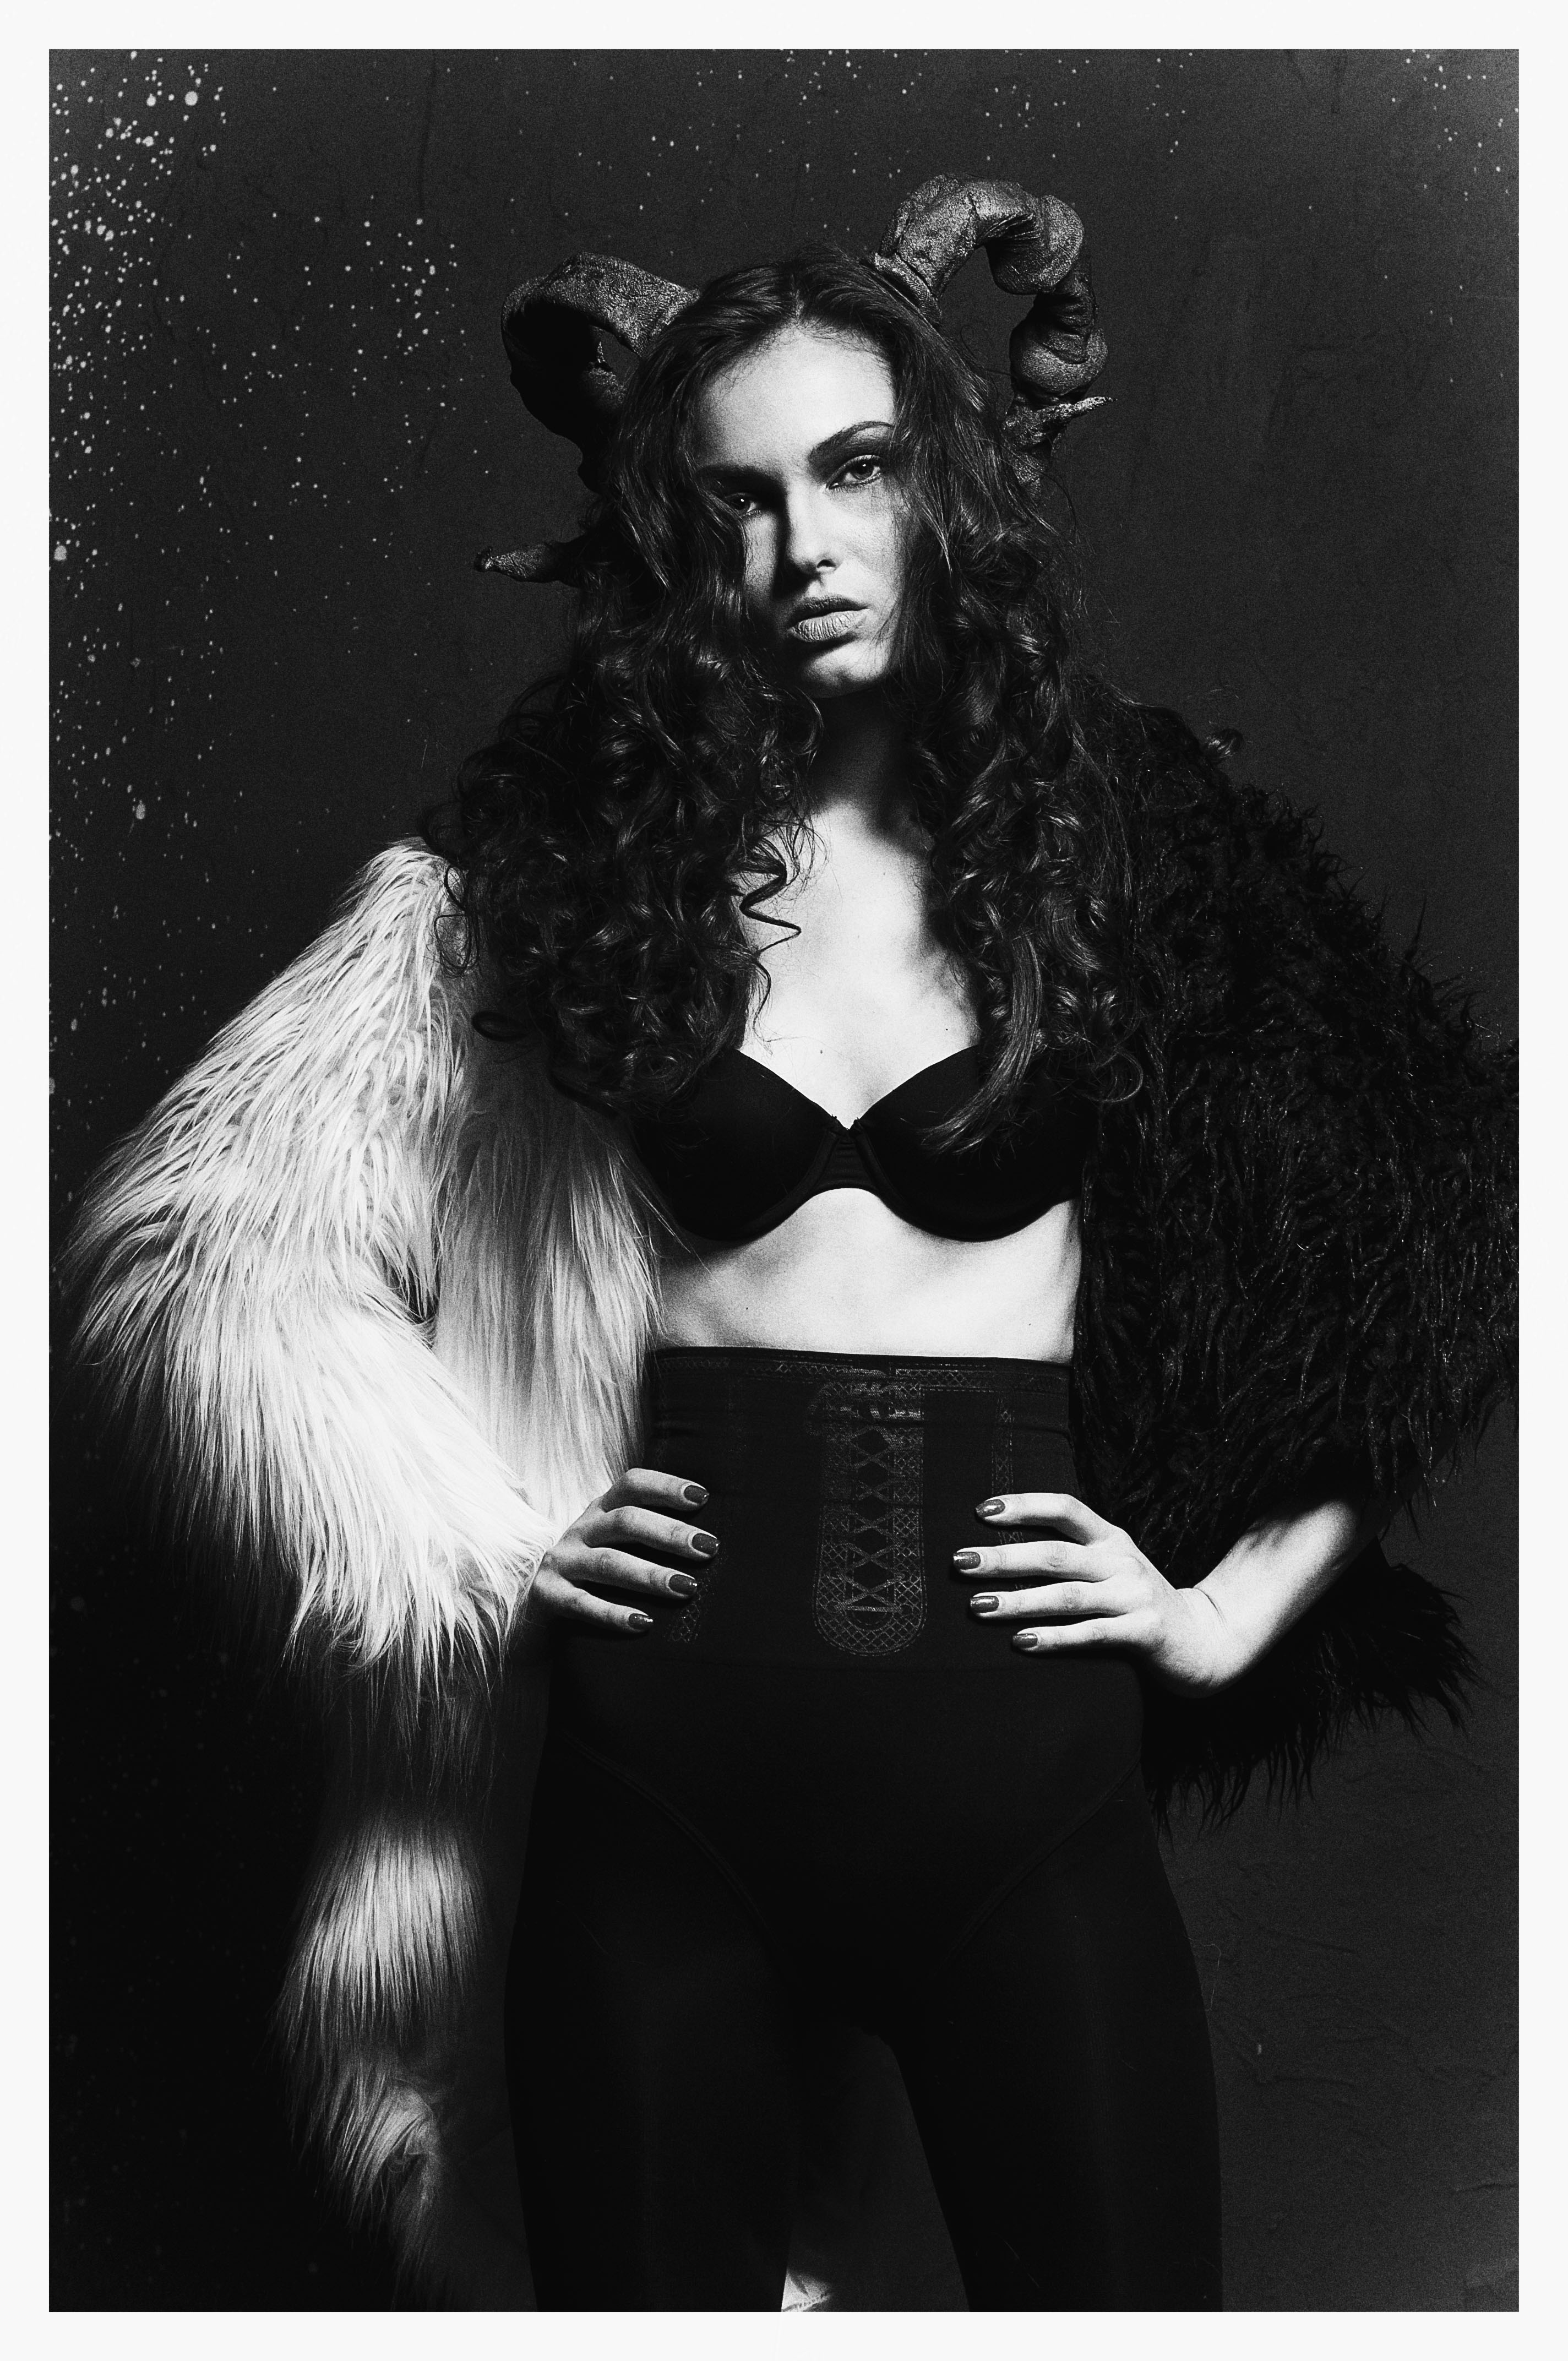 #face #monochrome #nude #body #skin #sepia #sexy #erotic #eye #toned #image #human #face #sleep #girl #model #fashion young light #women #cute #black #eyes #hair #white #beautiful #beauty #franpolonskiy #france #franpolonskiyphotographer #phfranpolonskiy , Фран Полонский